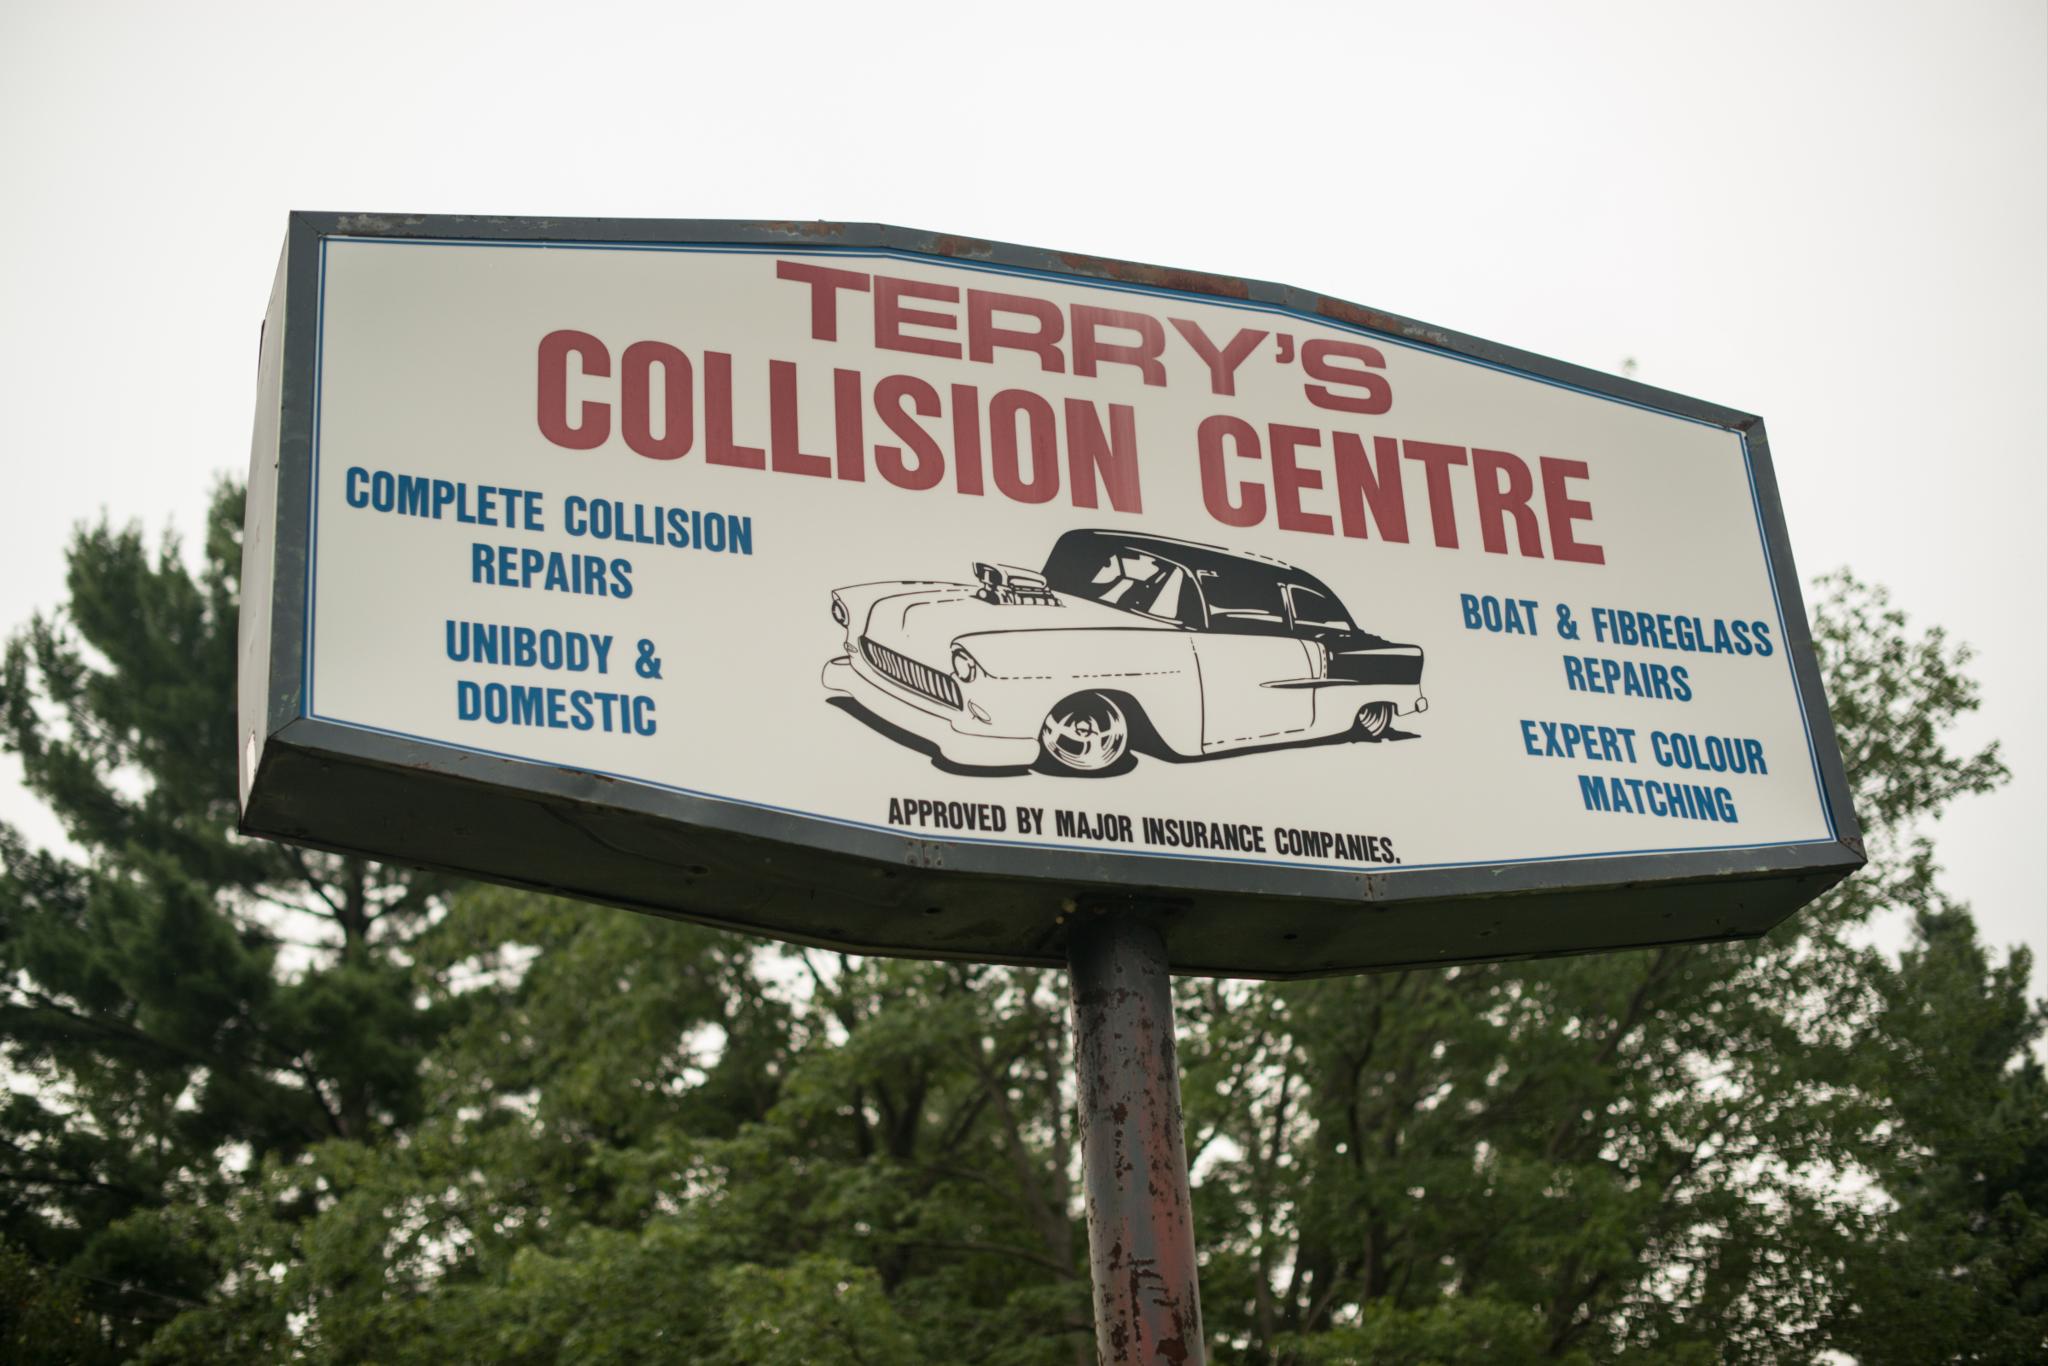 Terry's Collision Centre in Pembroke